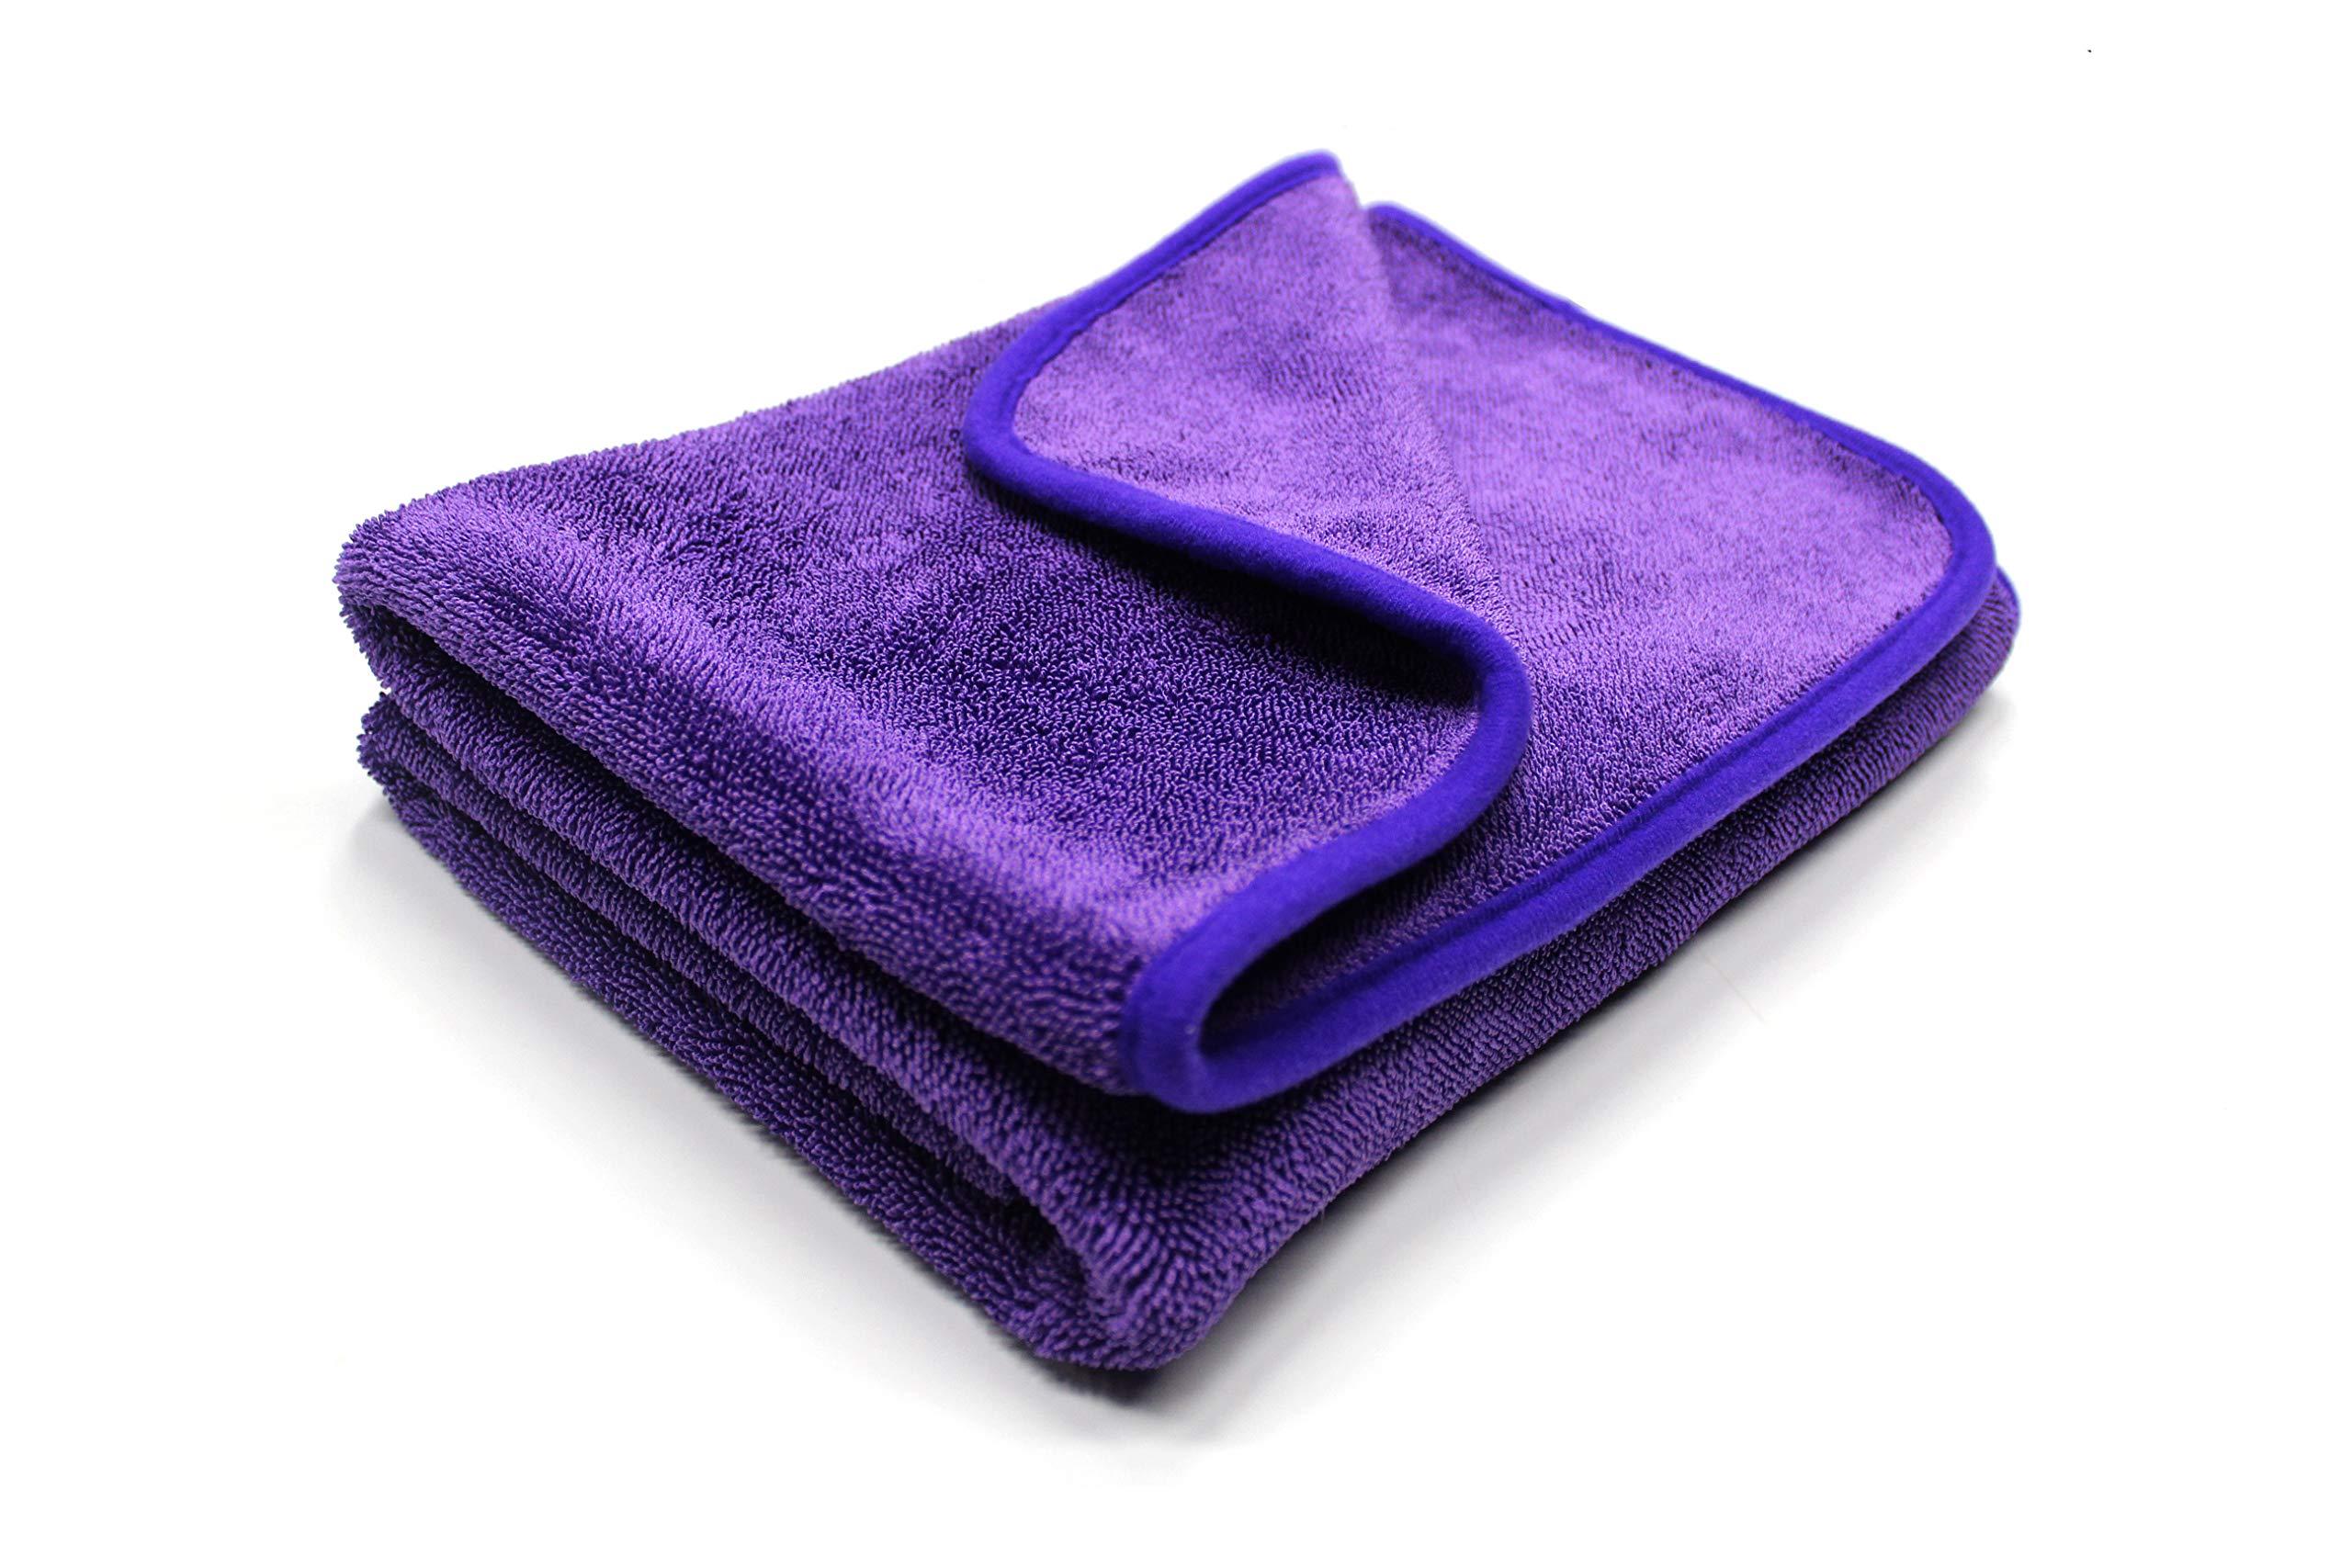 ShineMaster Maxshine 1200GSM Microfiber Duo Twisted Drying Towel for Car Detailing, Purple, 60x90cm